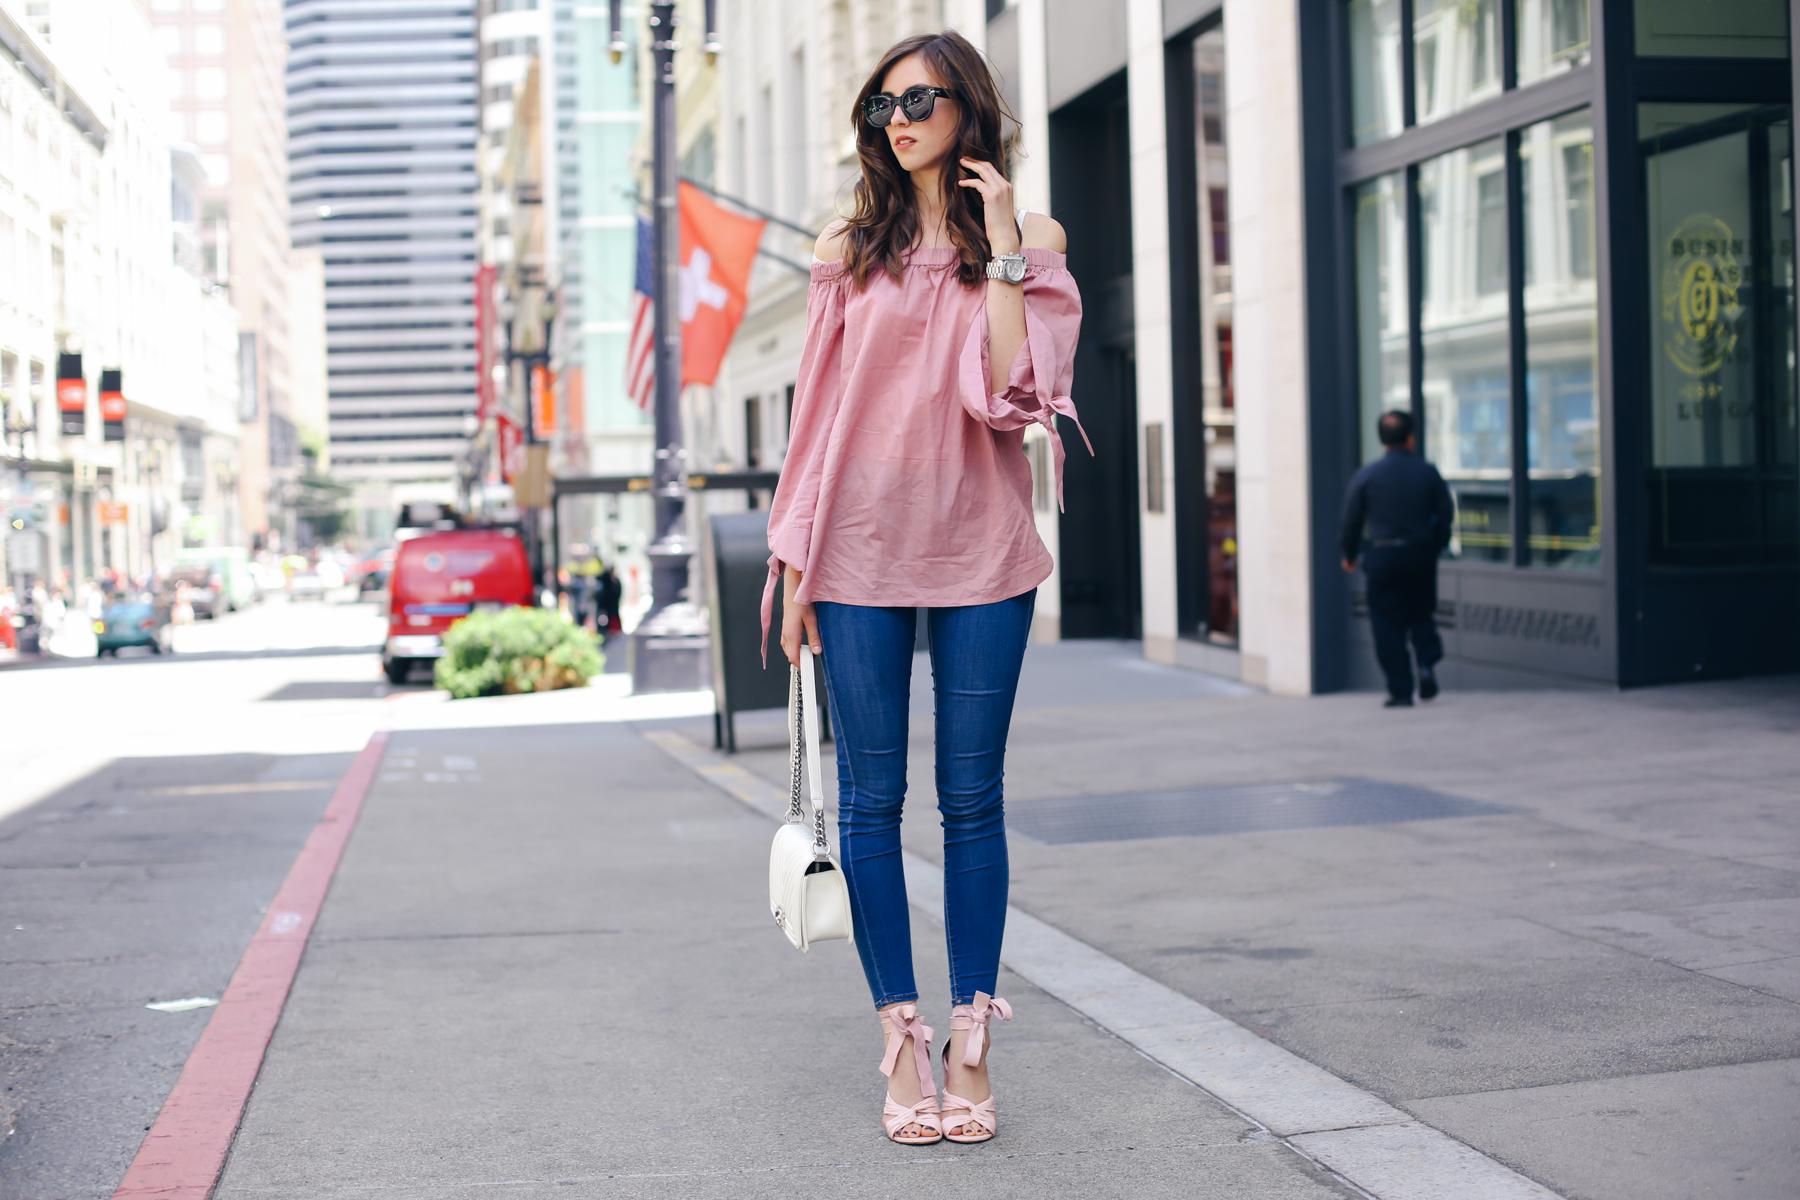 Barbora-Ondracova-FashioninmySoul-Fashion-Blogger-Photography-RyanbyRyanChua-7090